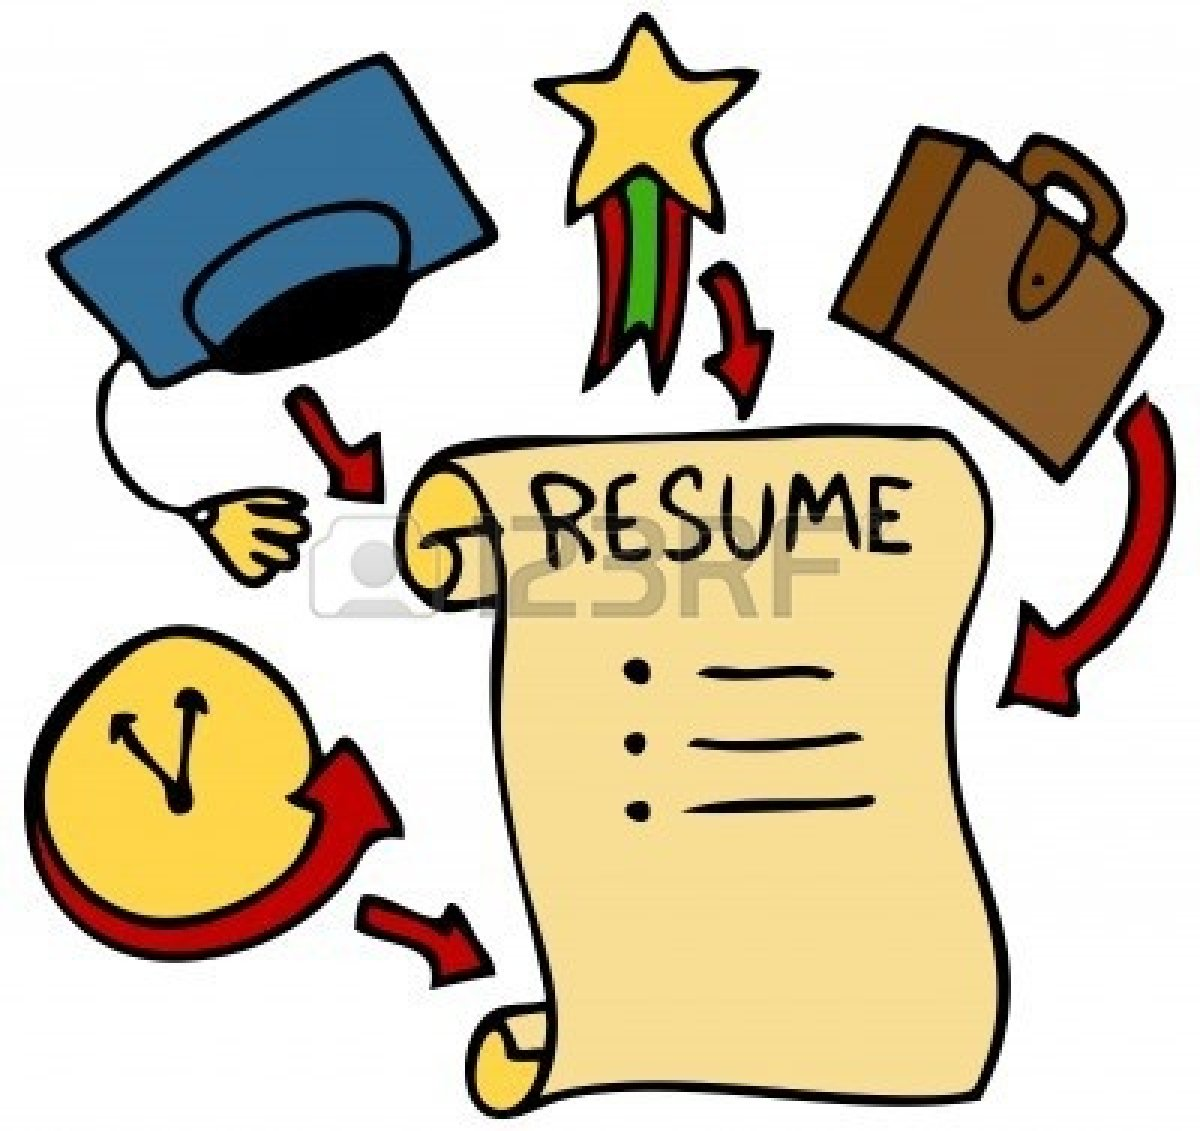 job resume clipart clipart kid resume 20clipart clipart panda clipart images